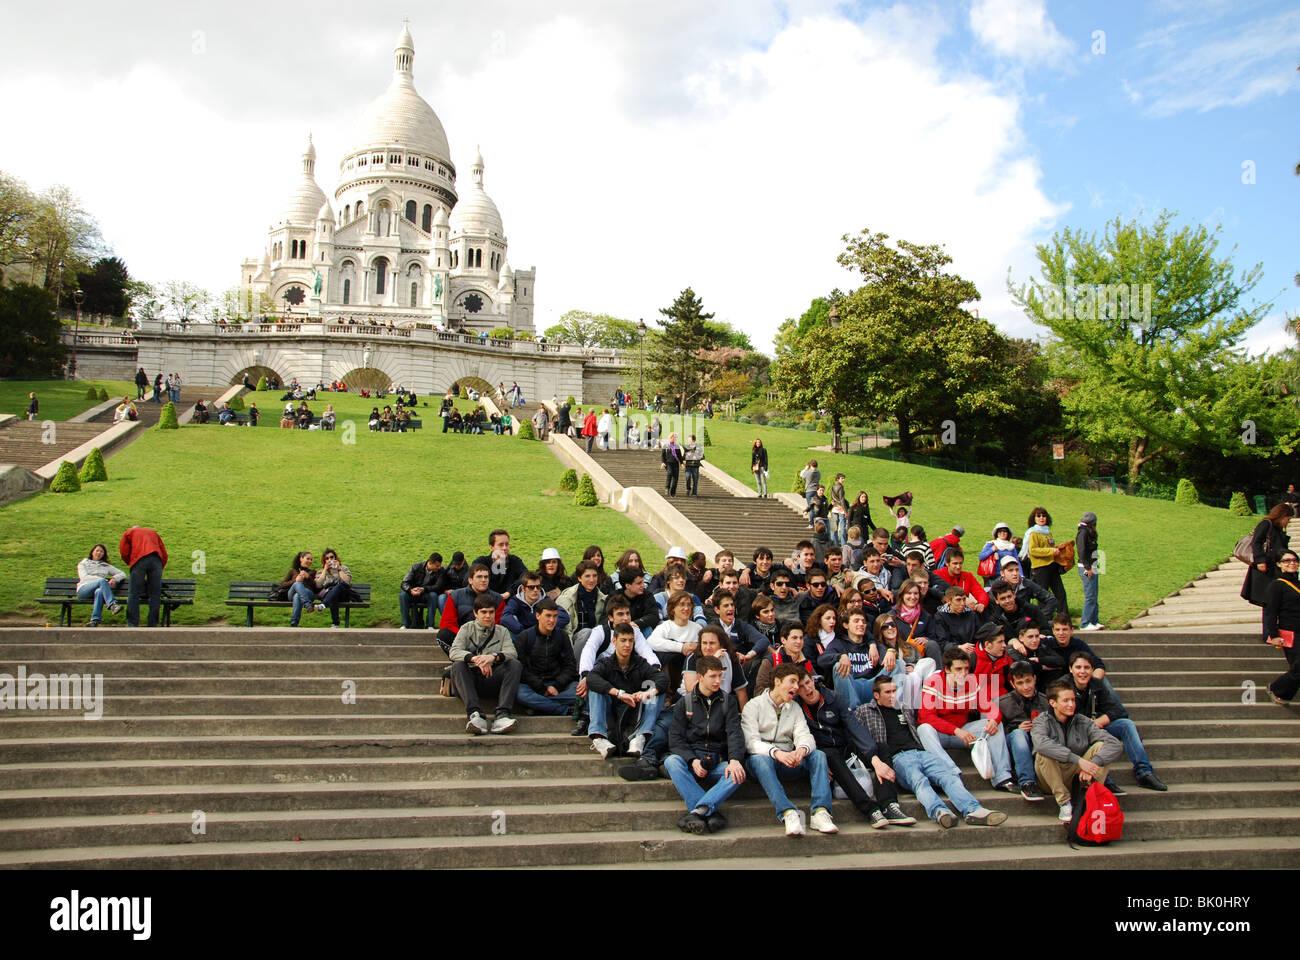 School group of teenagers posing for snapshot in front of Sacre Coeur Paris - Stock Image